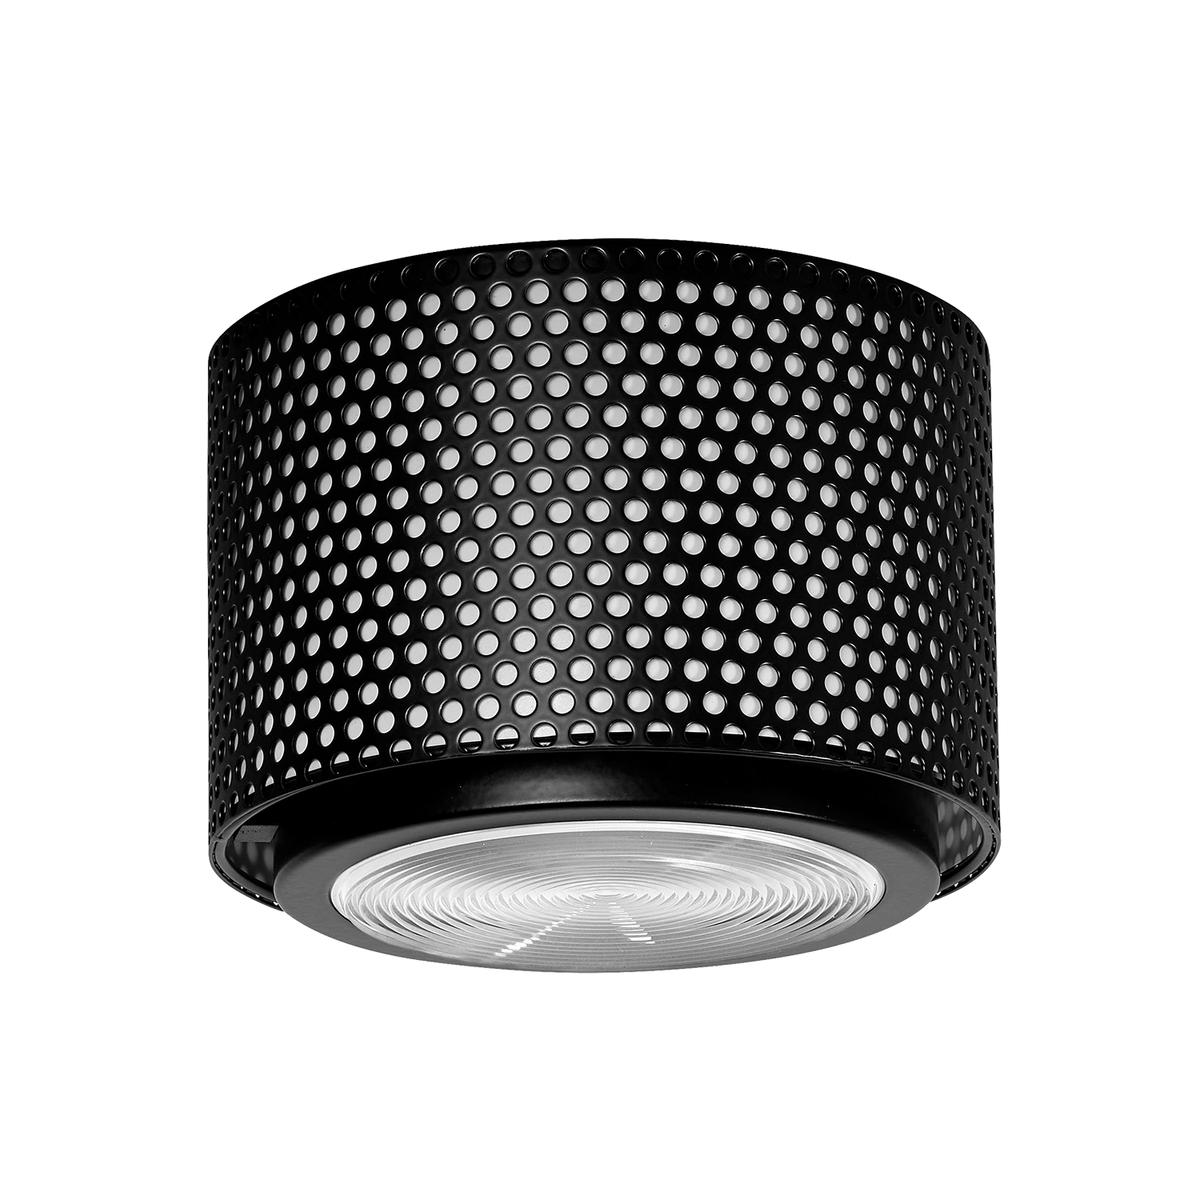 Sammode G13 Ceiling Lamp, Small, Black